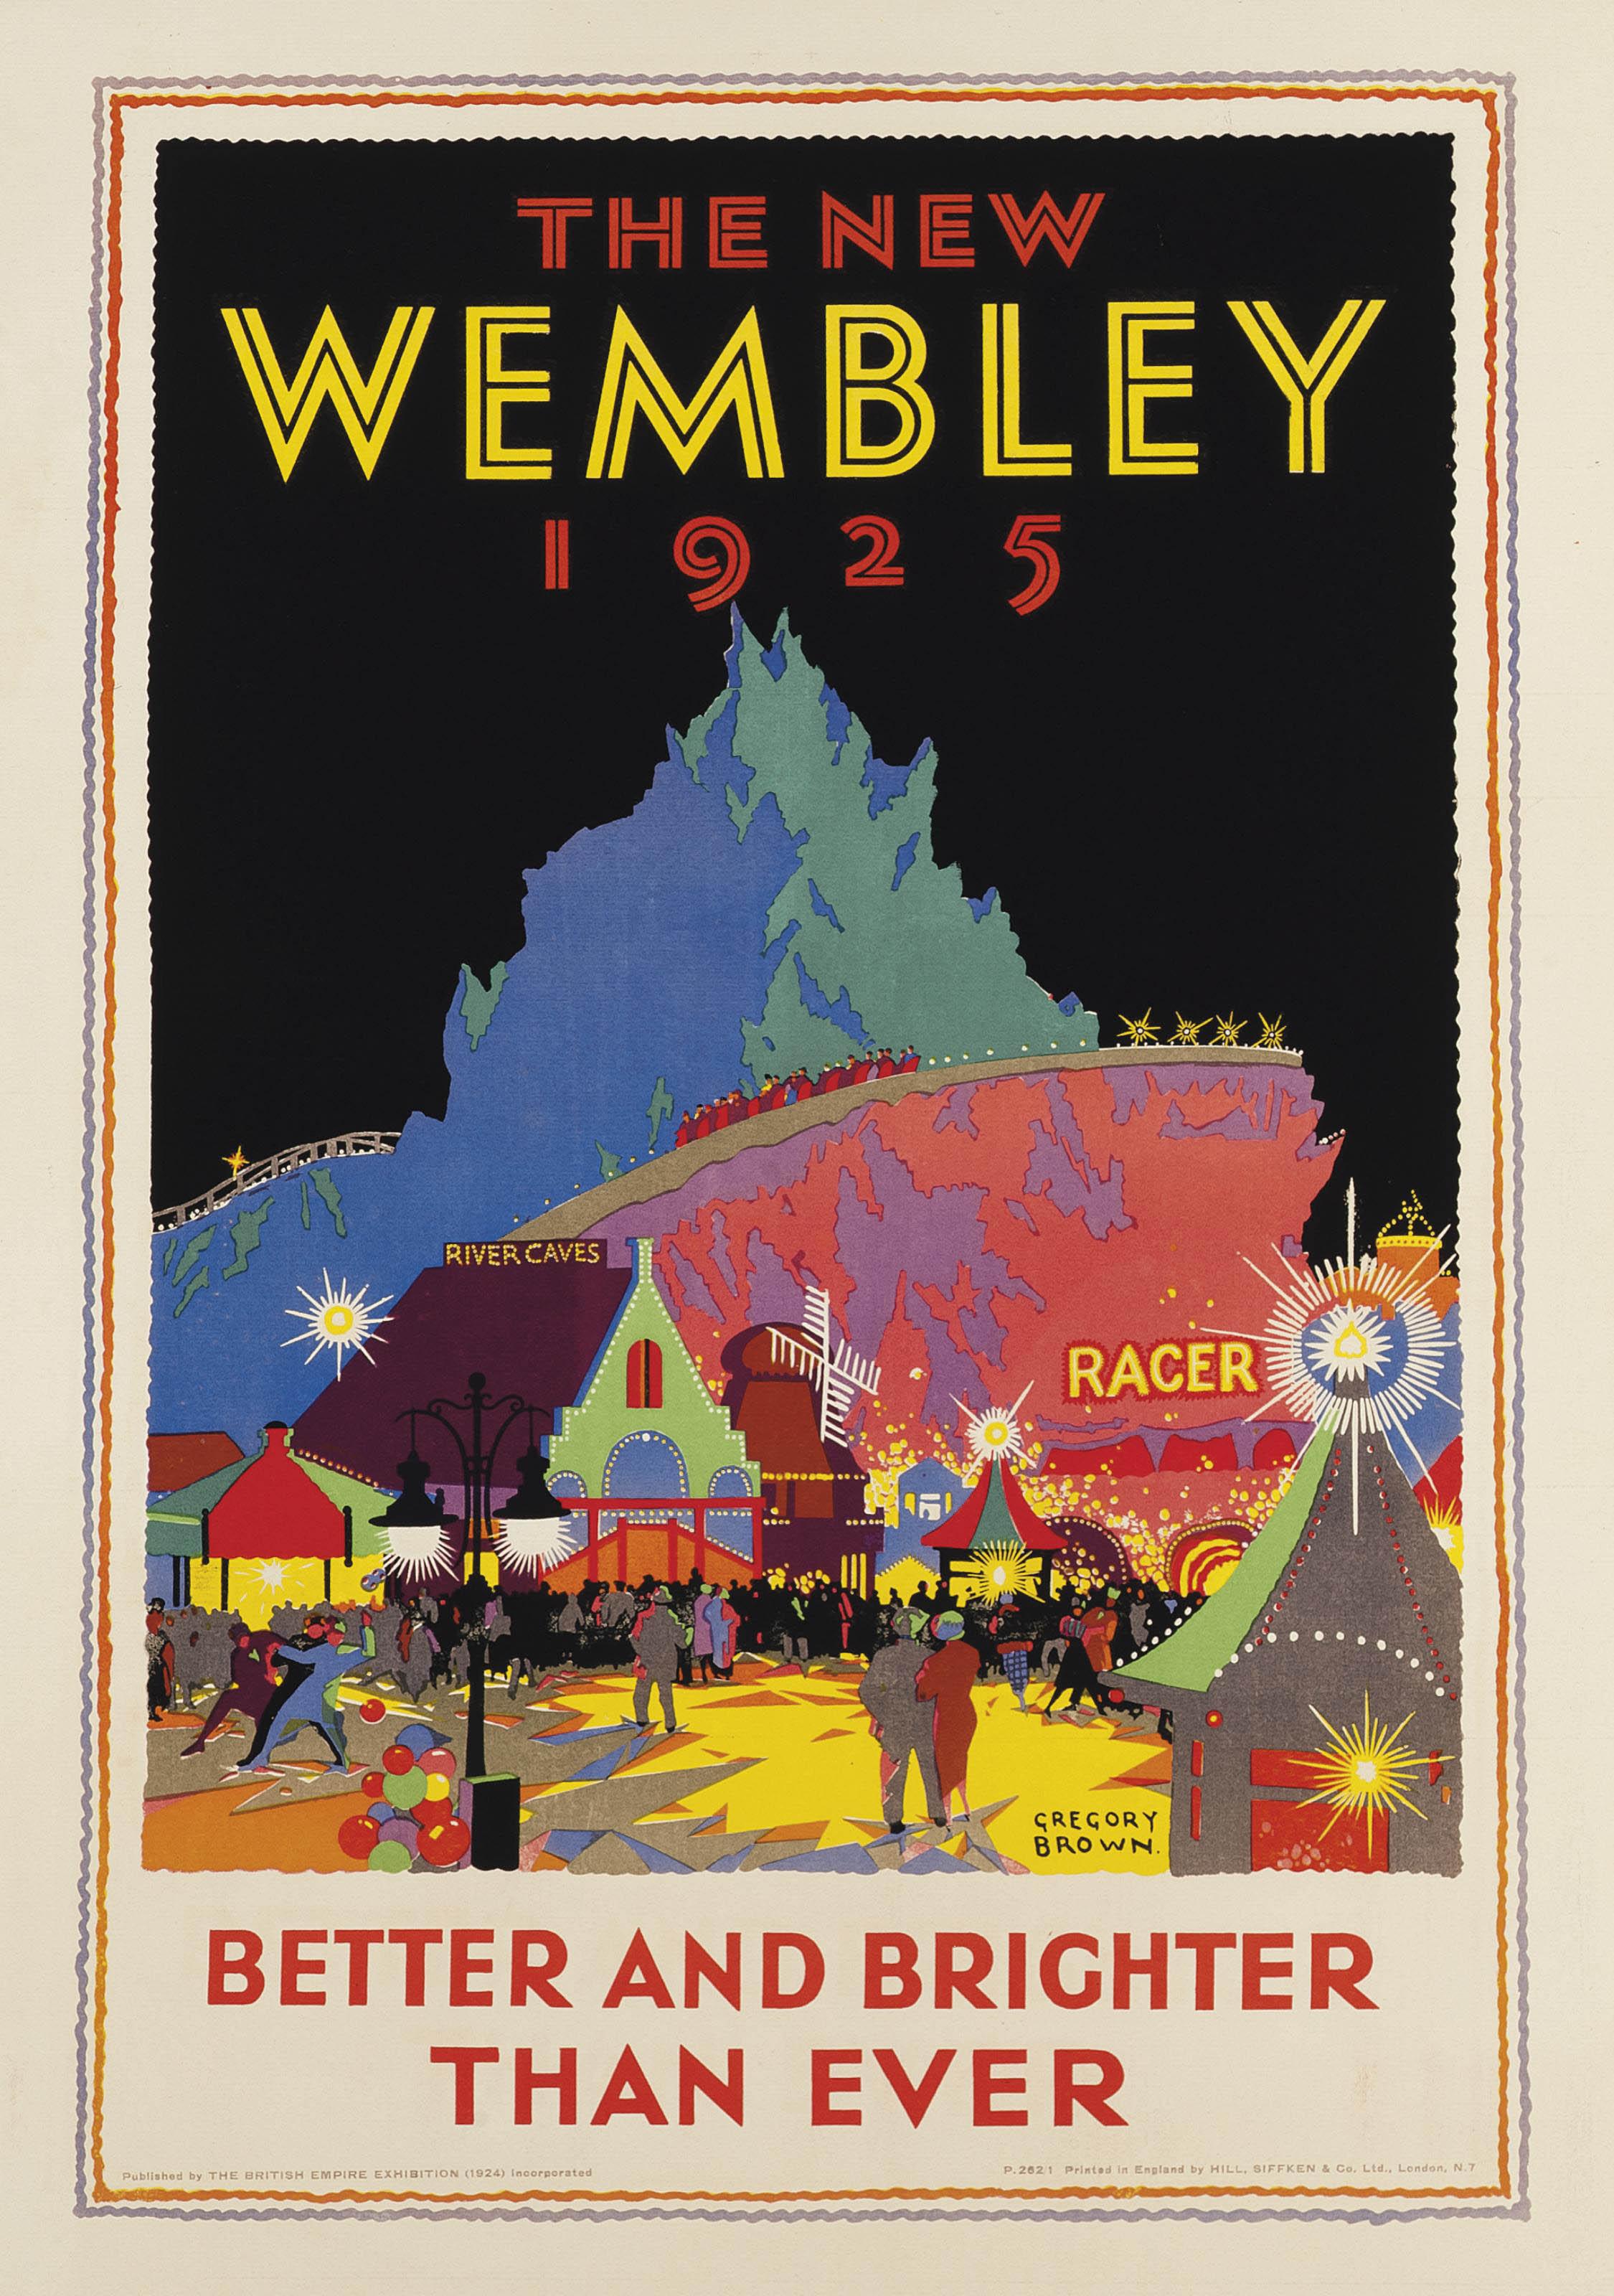 THE NEW WEMBLEY 1925